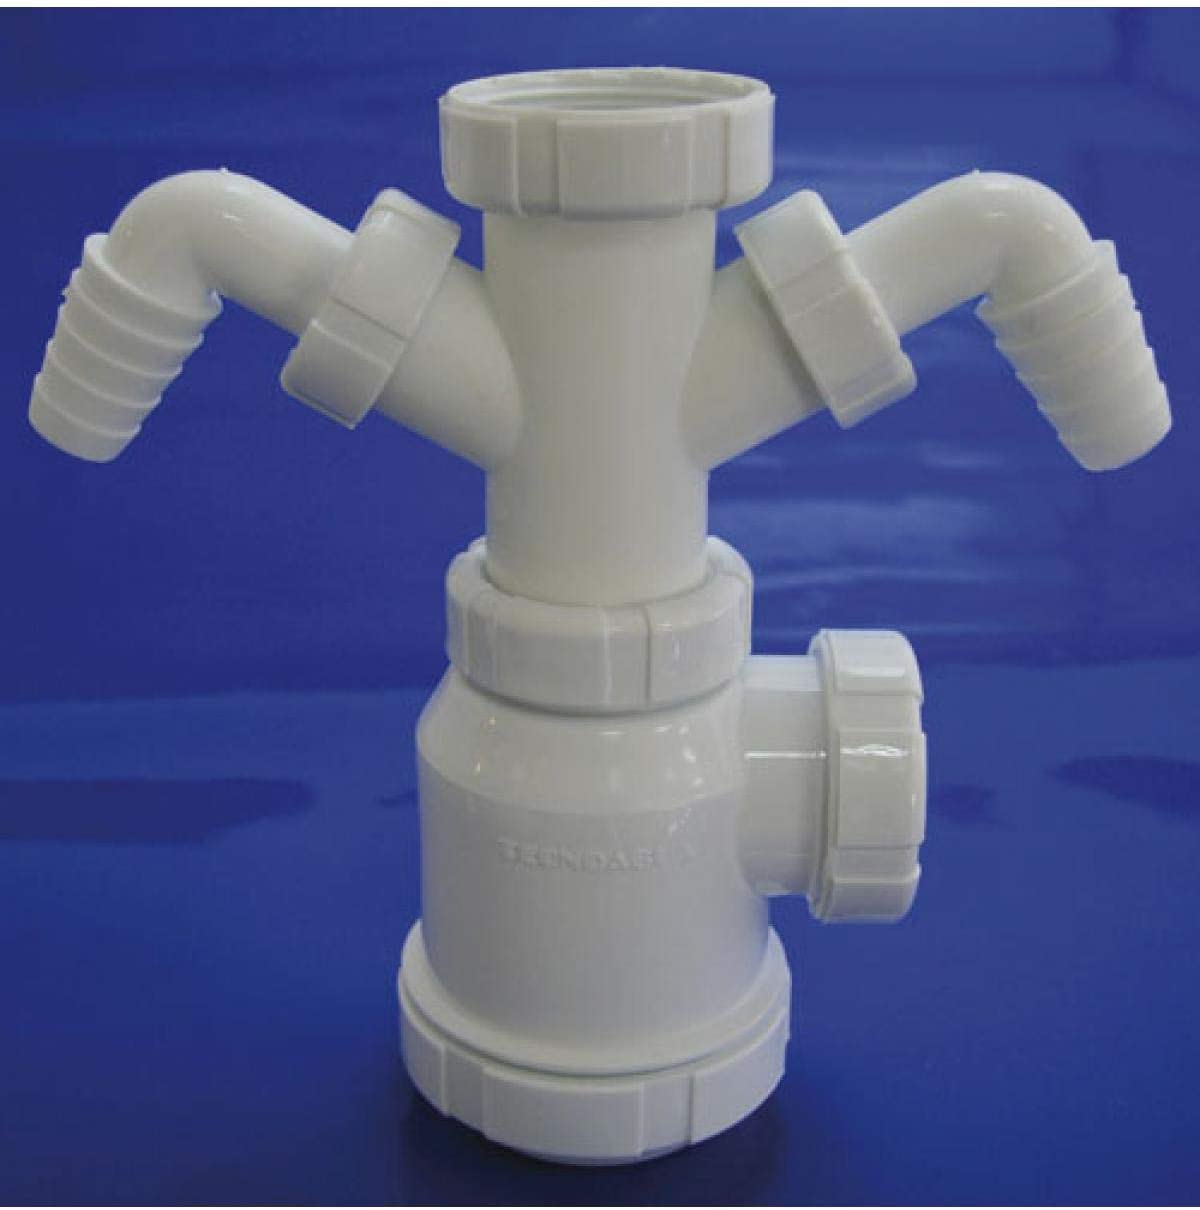 WOLFPACK LINEA PROFESIONAL 4110240 Sifon Botella Extensible T-4-TD 1 1/2 2 Tomas Lavadora